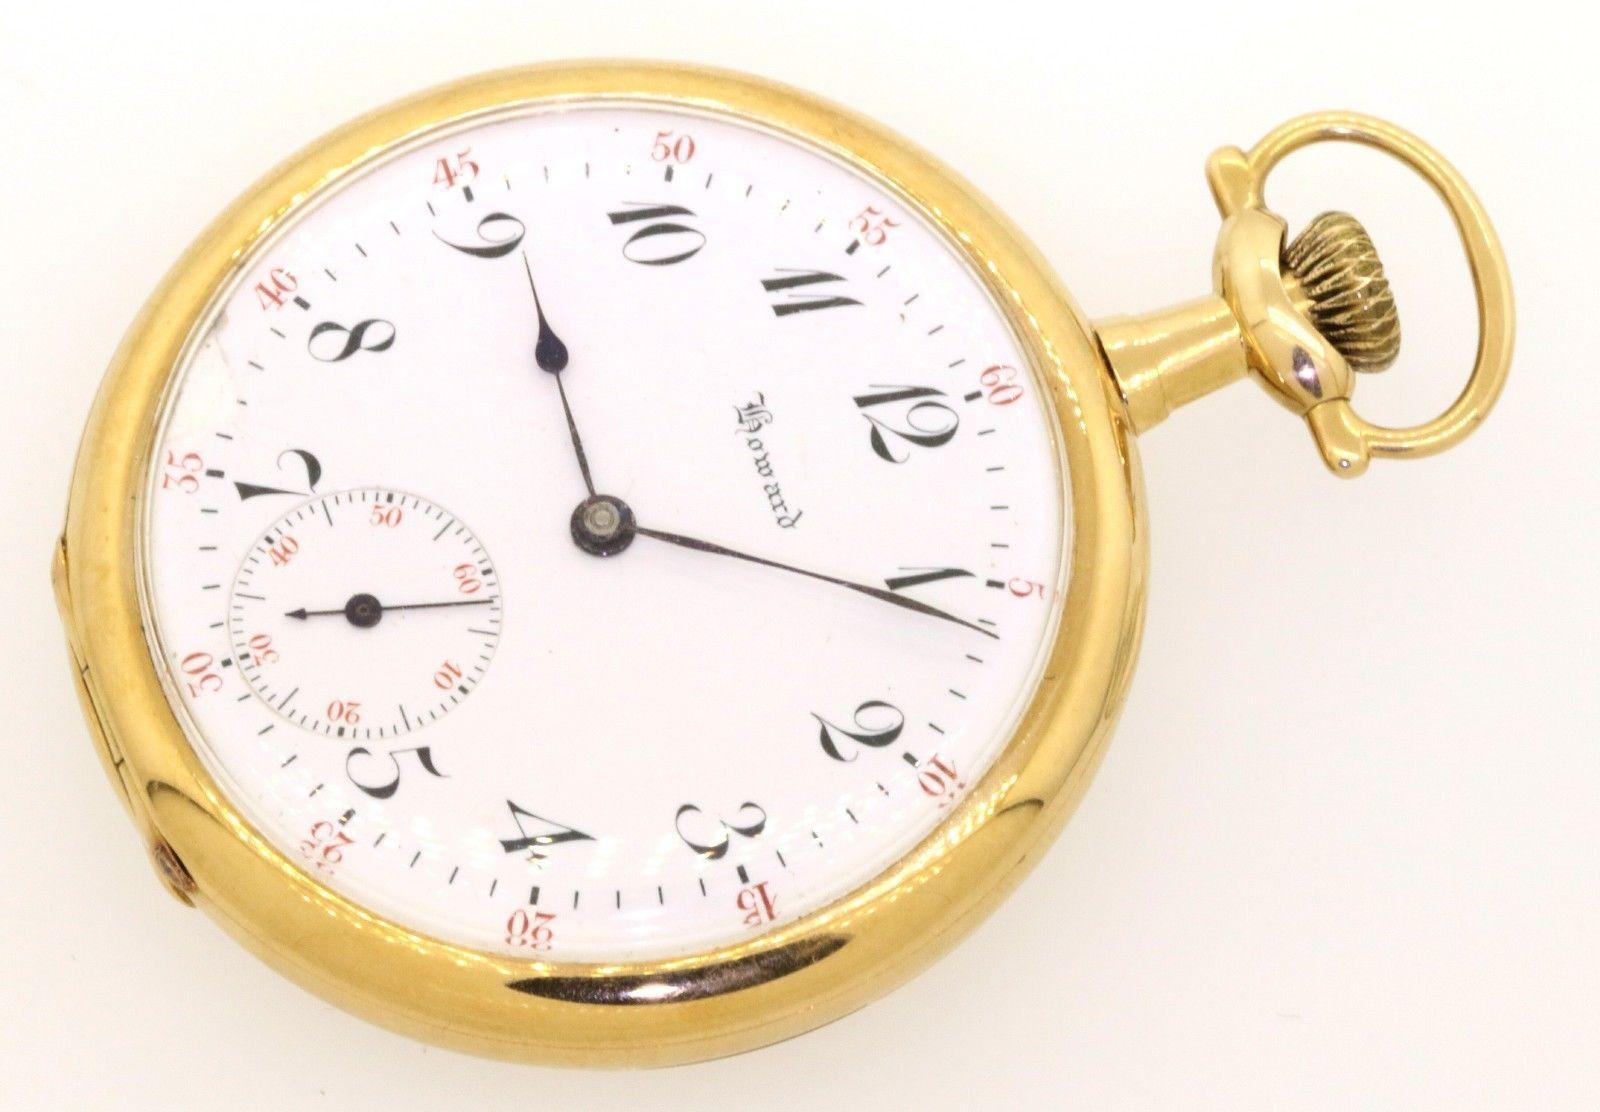 E. Howard Watch Co. antique 14K gold mechanical pocket watch https://t.co/TQuIrednbu https://t.co/6MHsaWlTrs